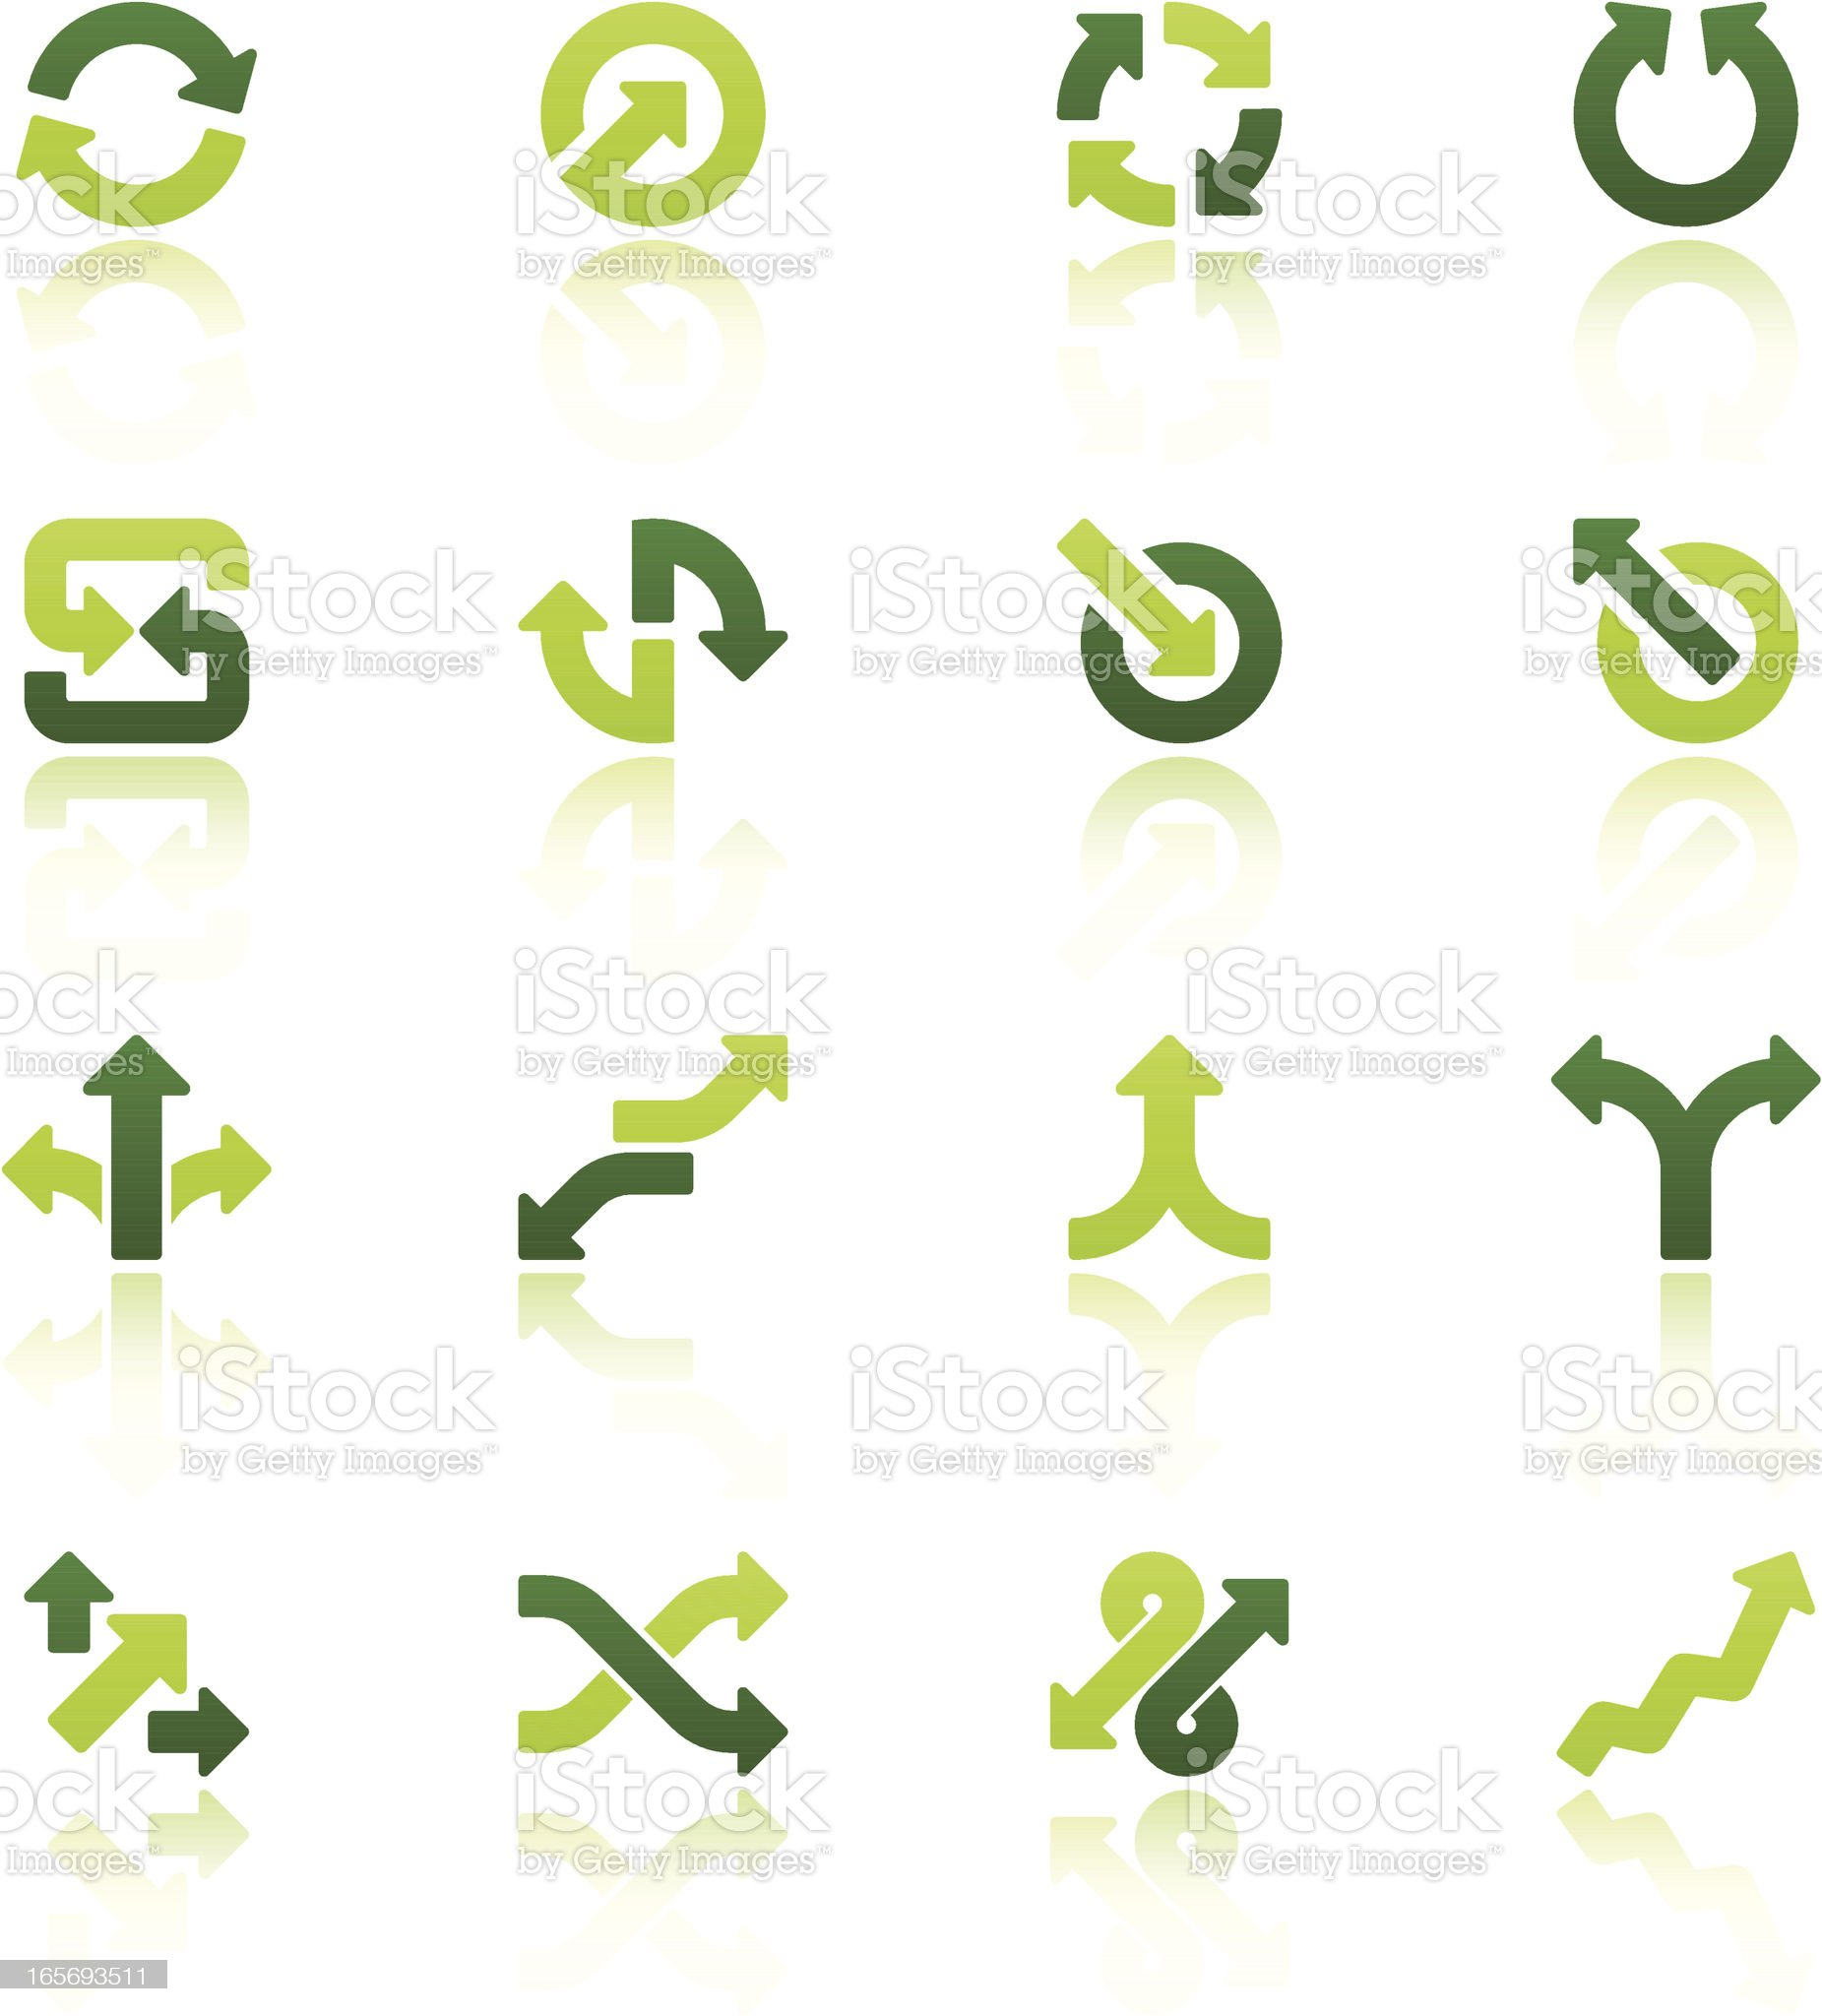 arrow signs icon set V fresh reflection royalty-free stock vector art